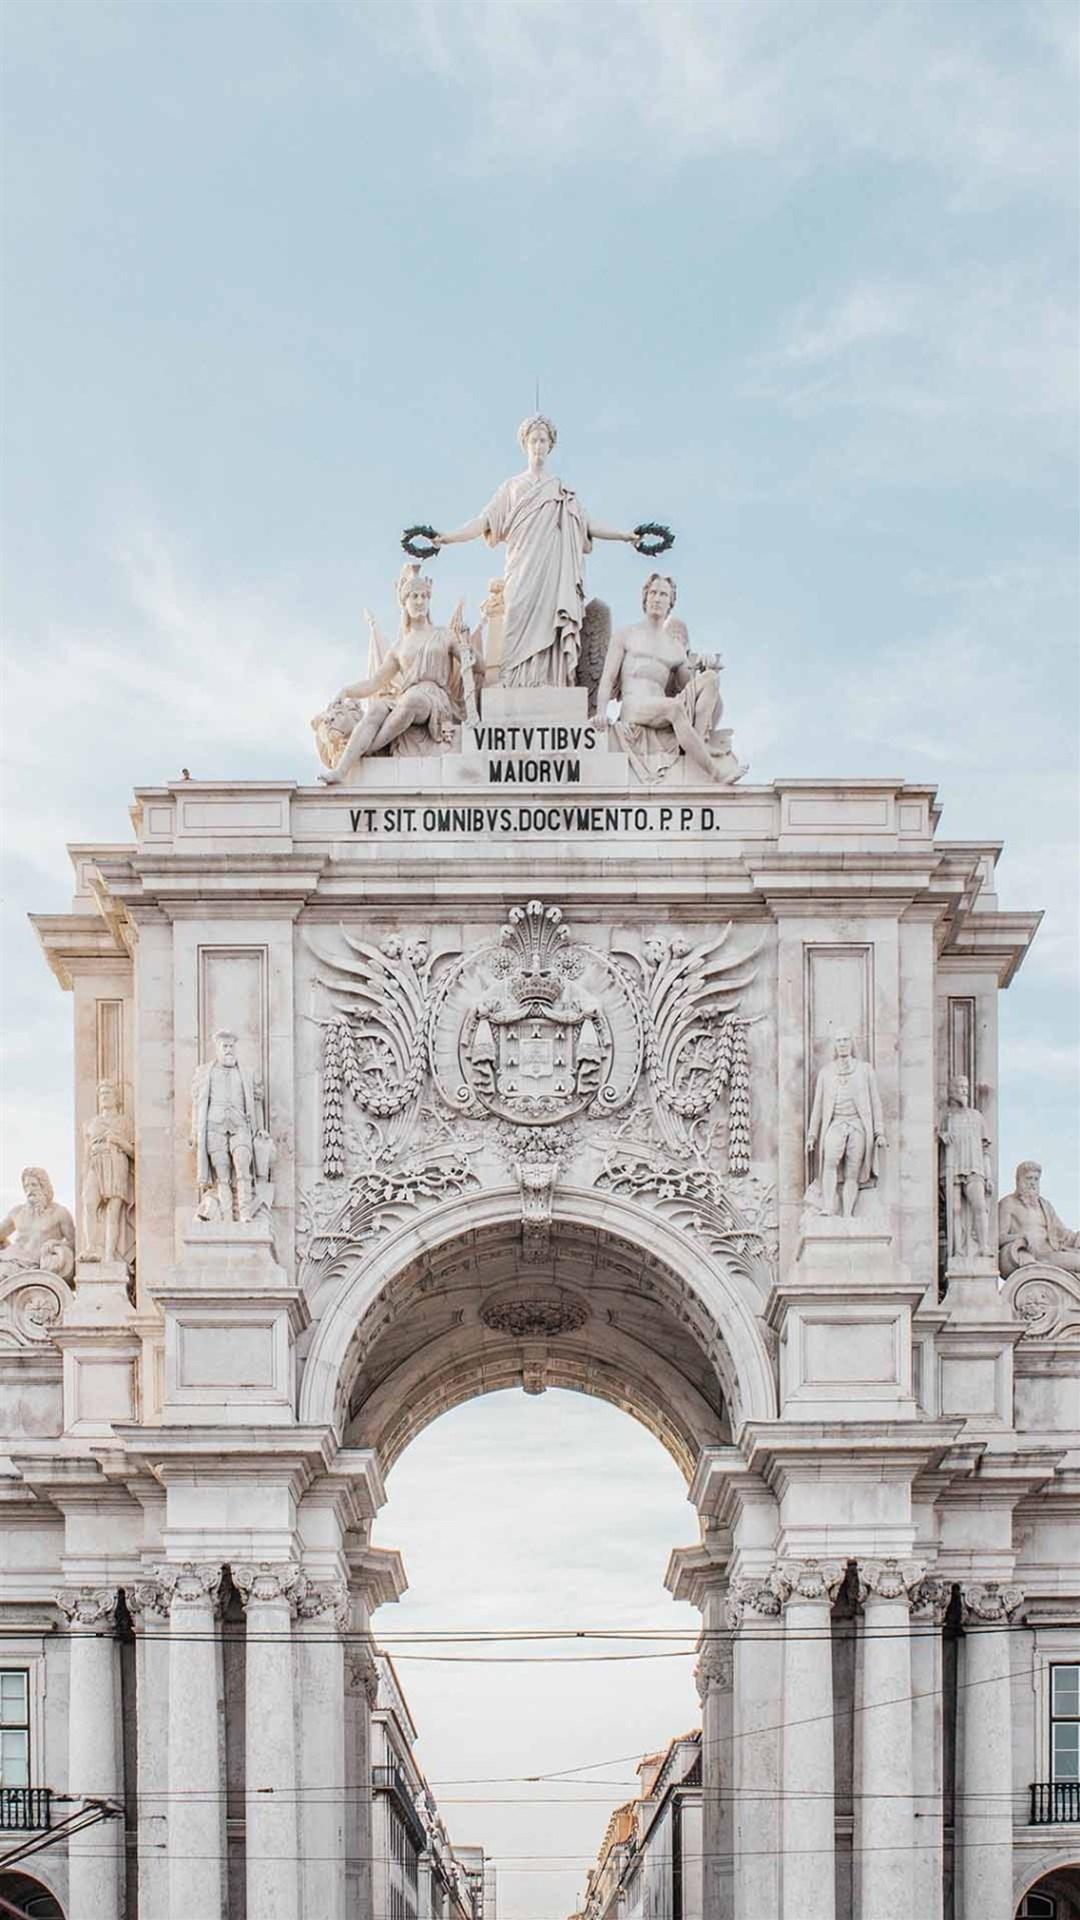 【v粉壁纸】法国巴黎风景名胜手机壁纸